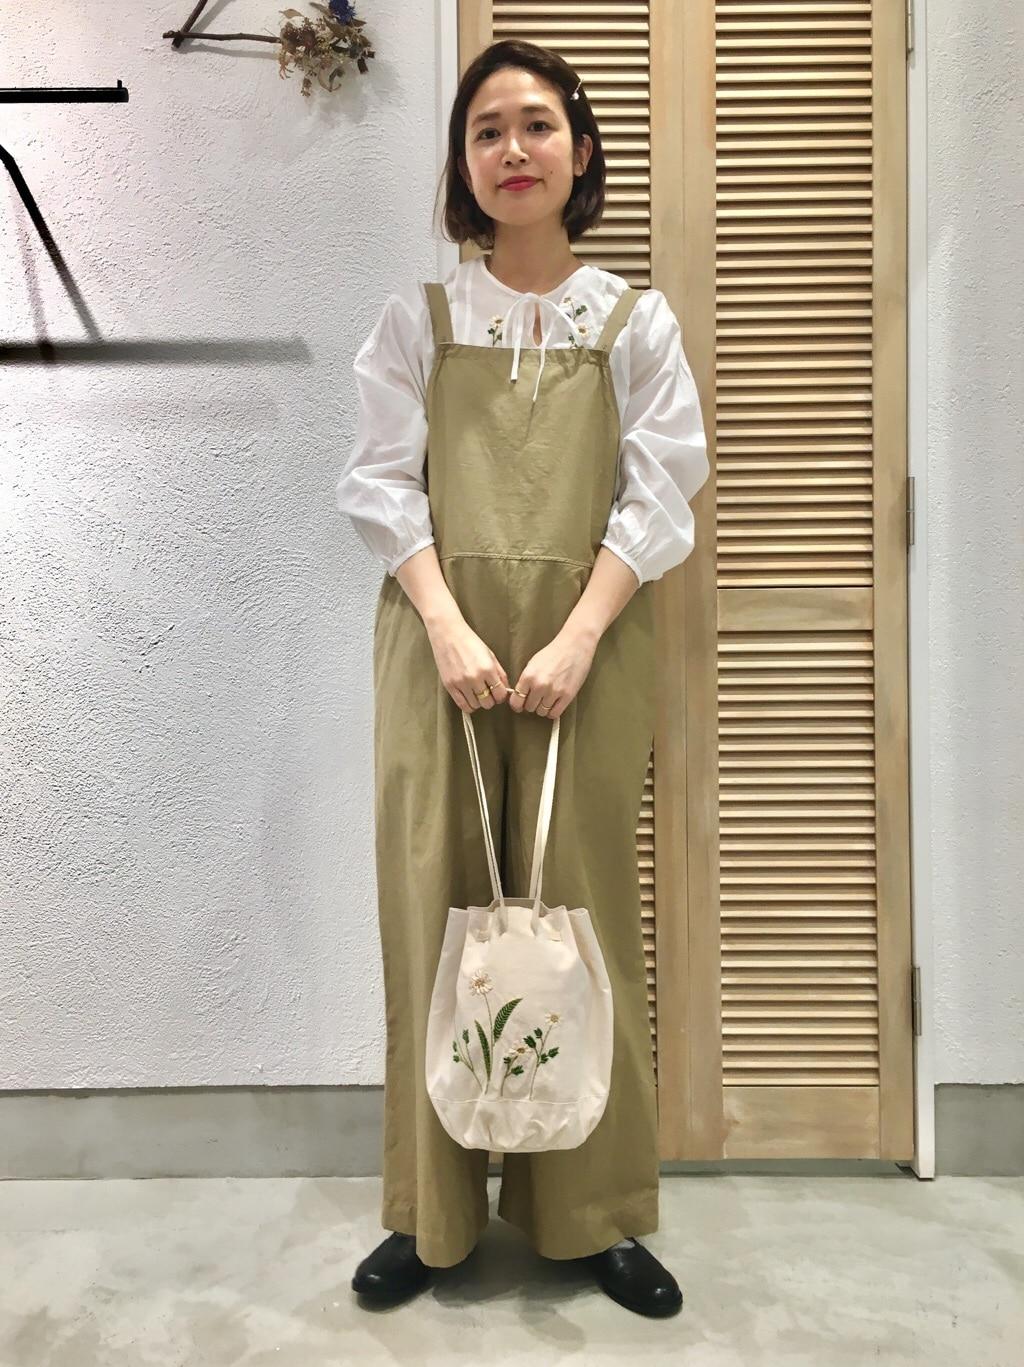 chambre de charme 横浜ジョイナス 身長:160cm 2021.02.08